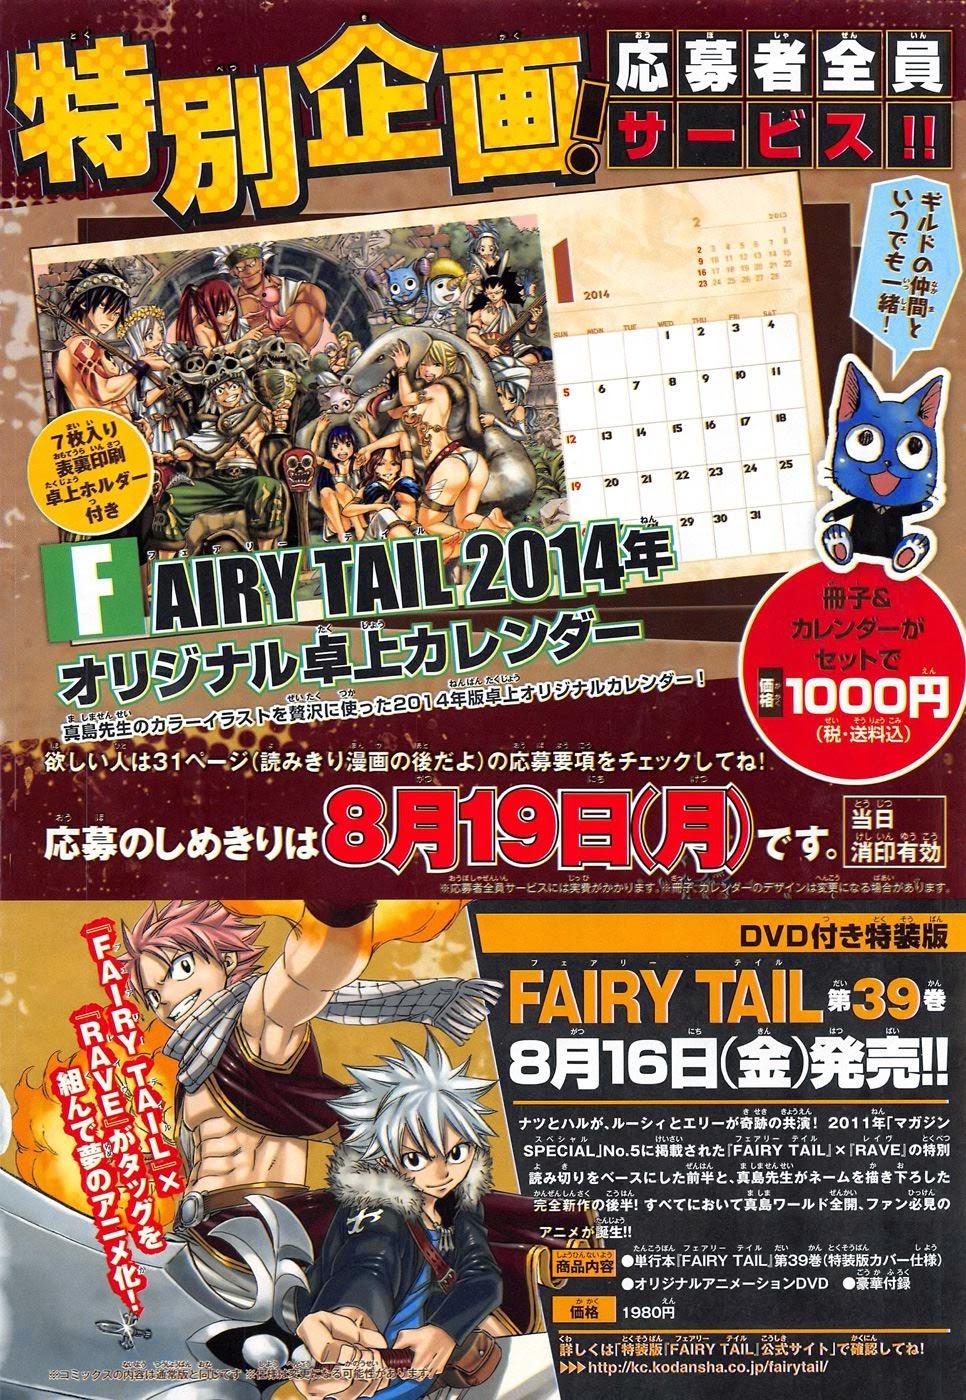 TruyenHay.Com - Ảnh 6 - Fairy Tail Chap 345.5